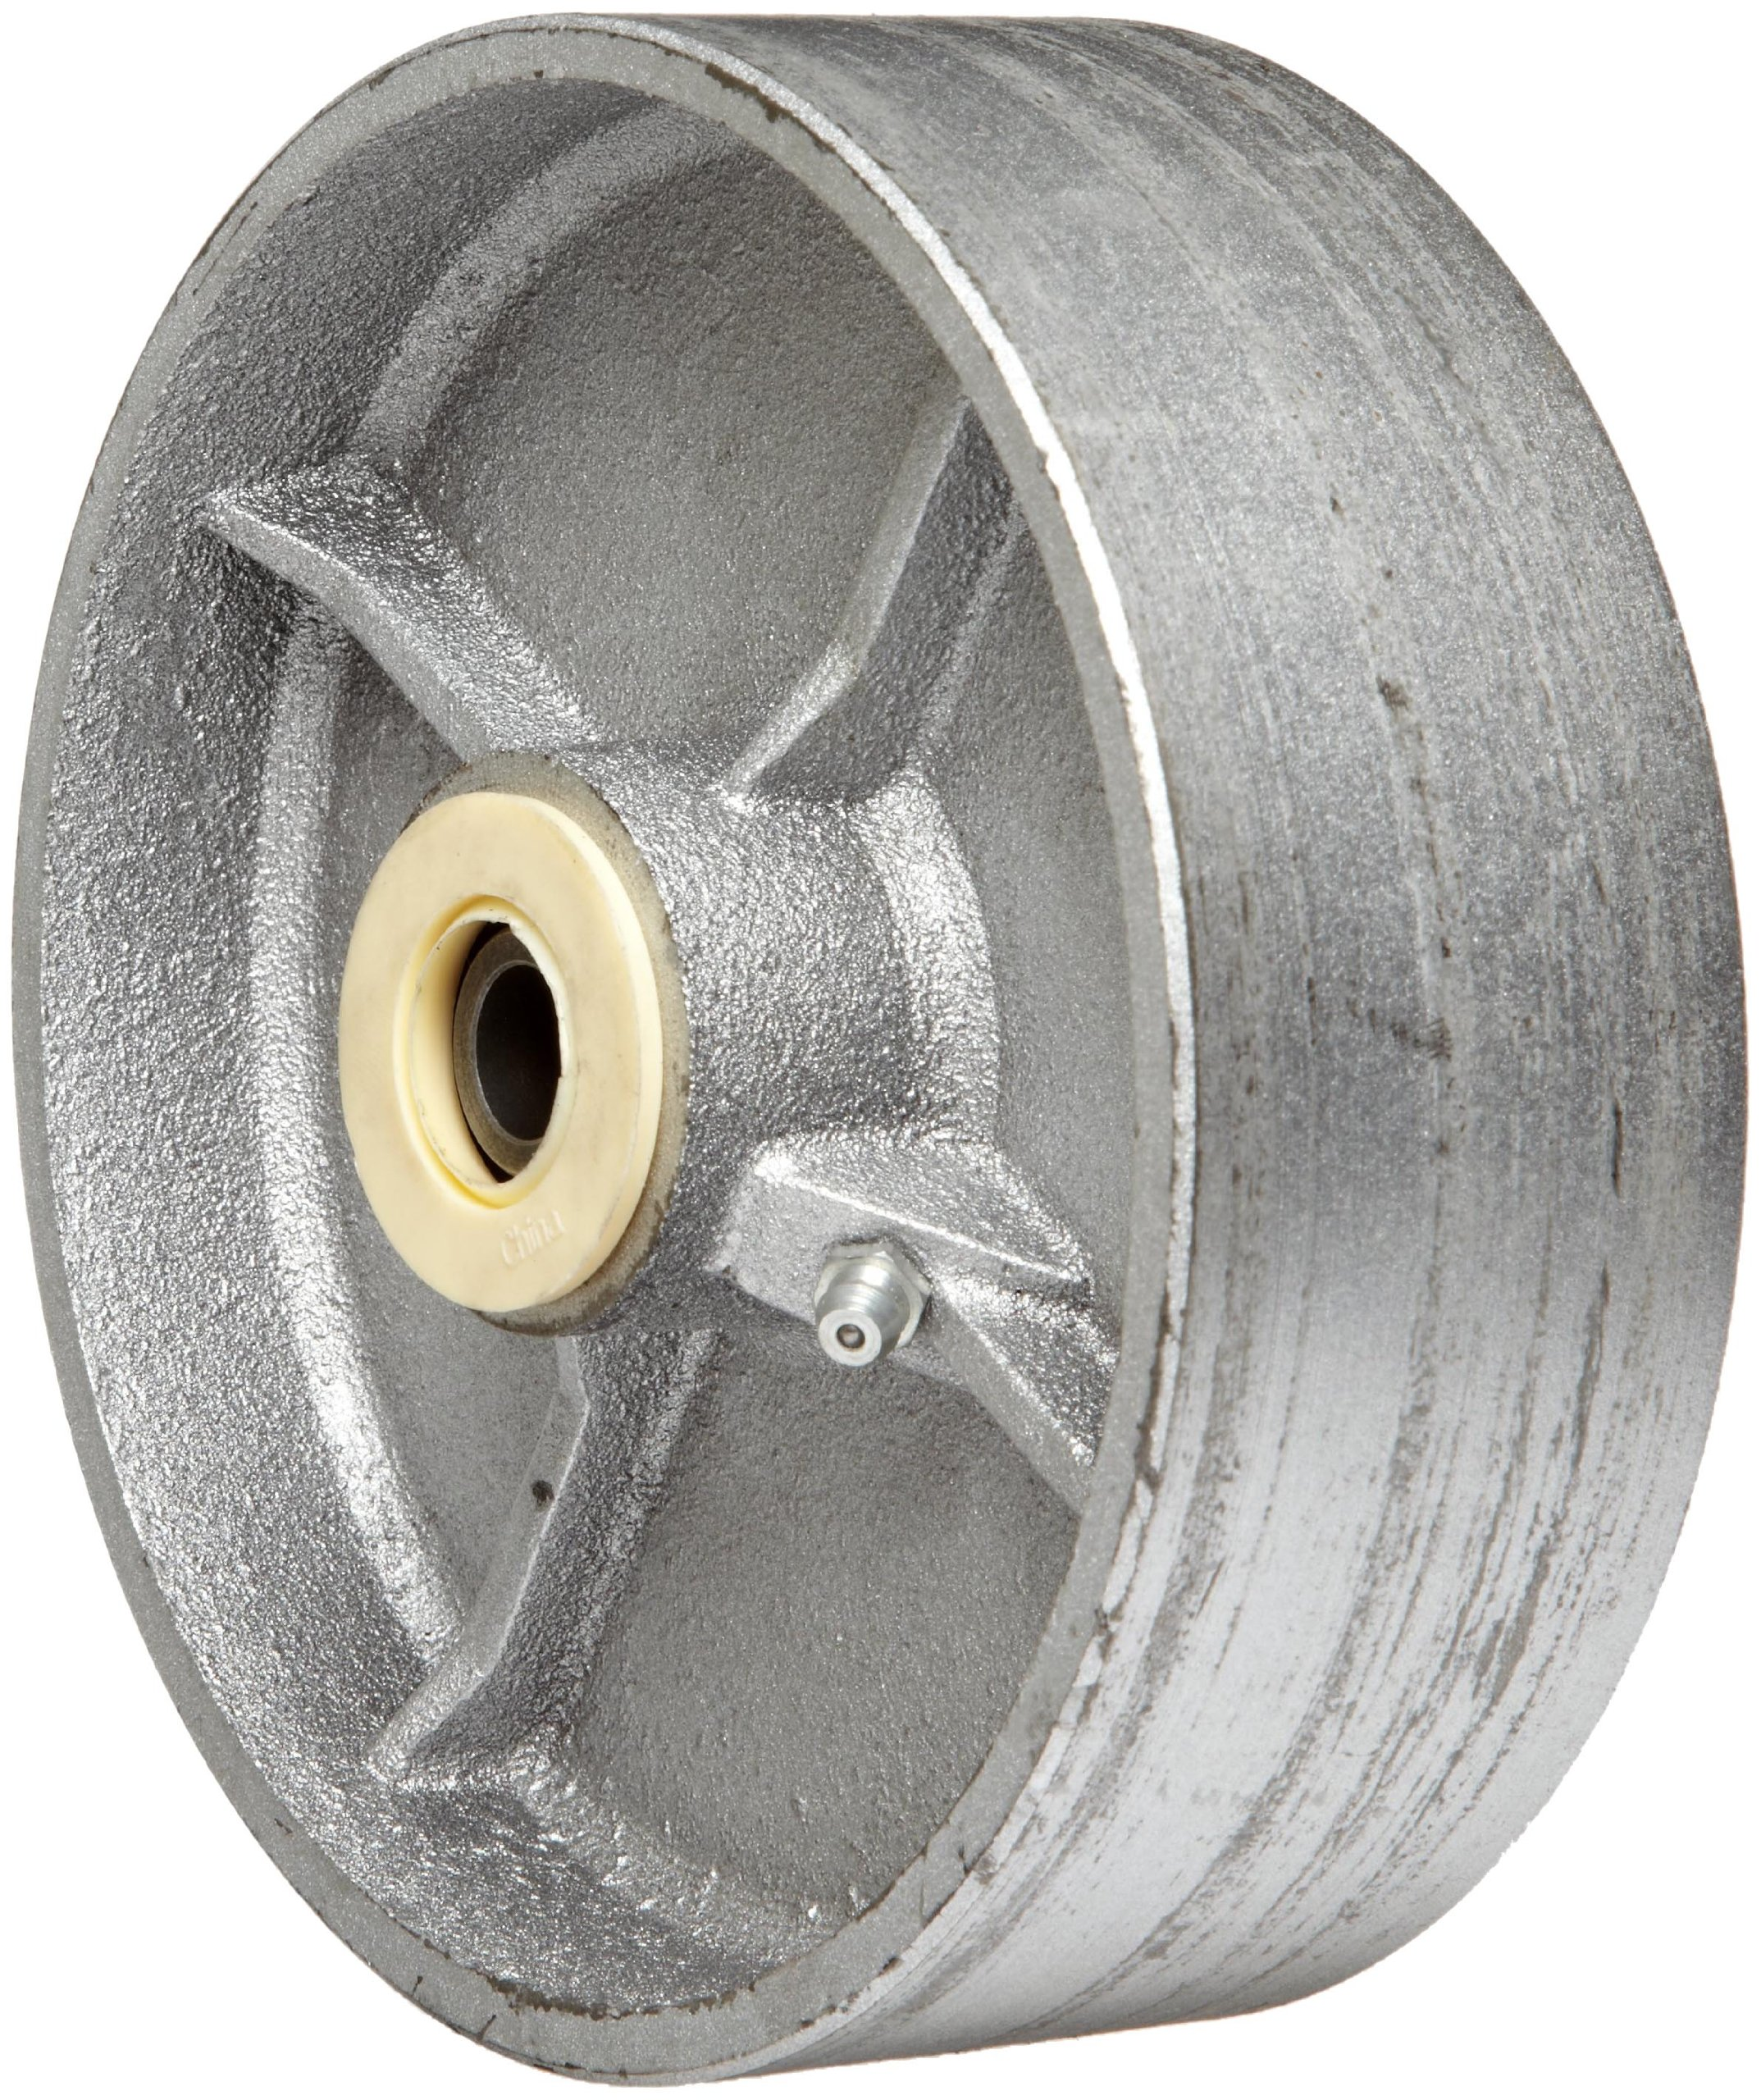 EZ Roll WEZ-0620-STR 6'' Diameter Semi-Steel Roller Bearing Wheel, 1200 lbs Load Capacity